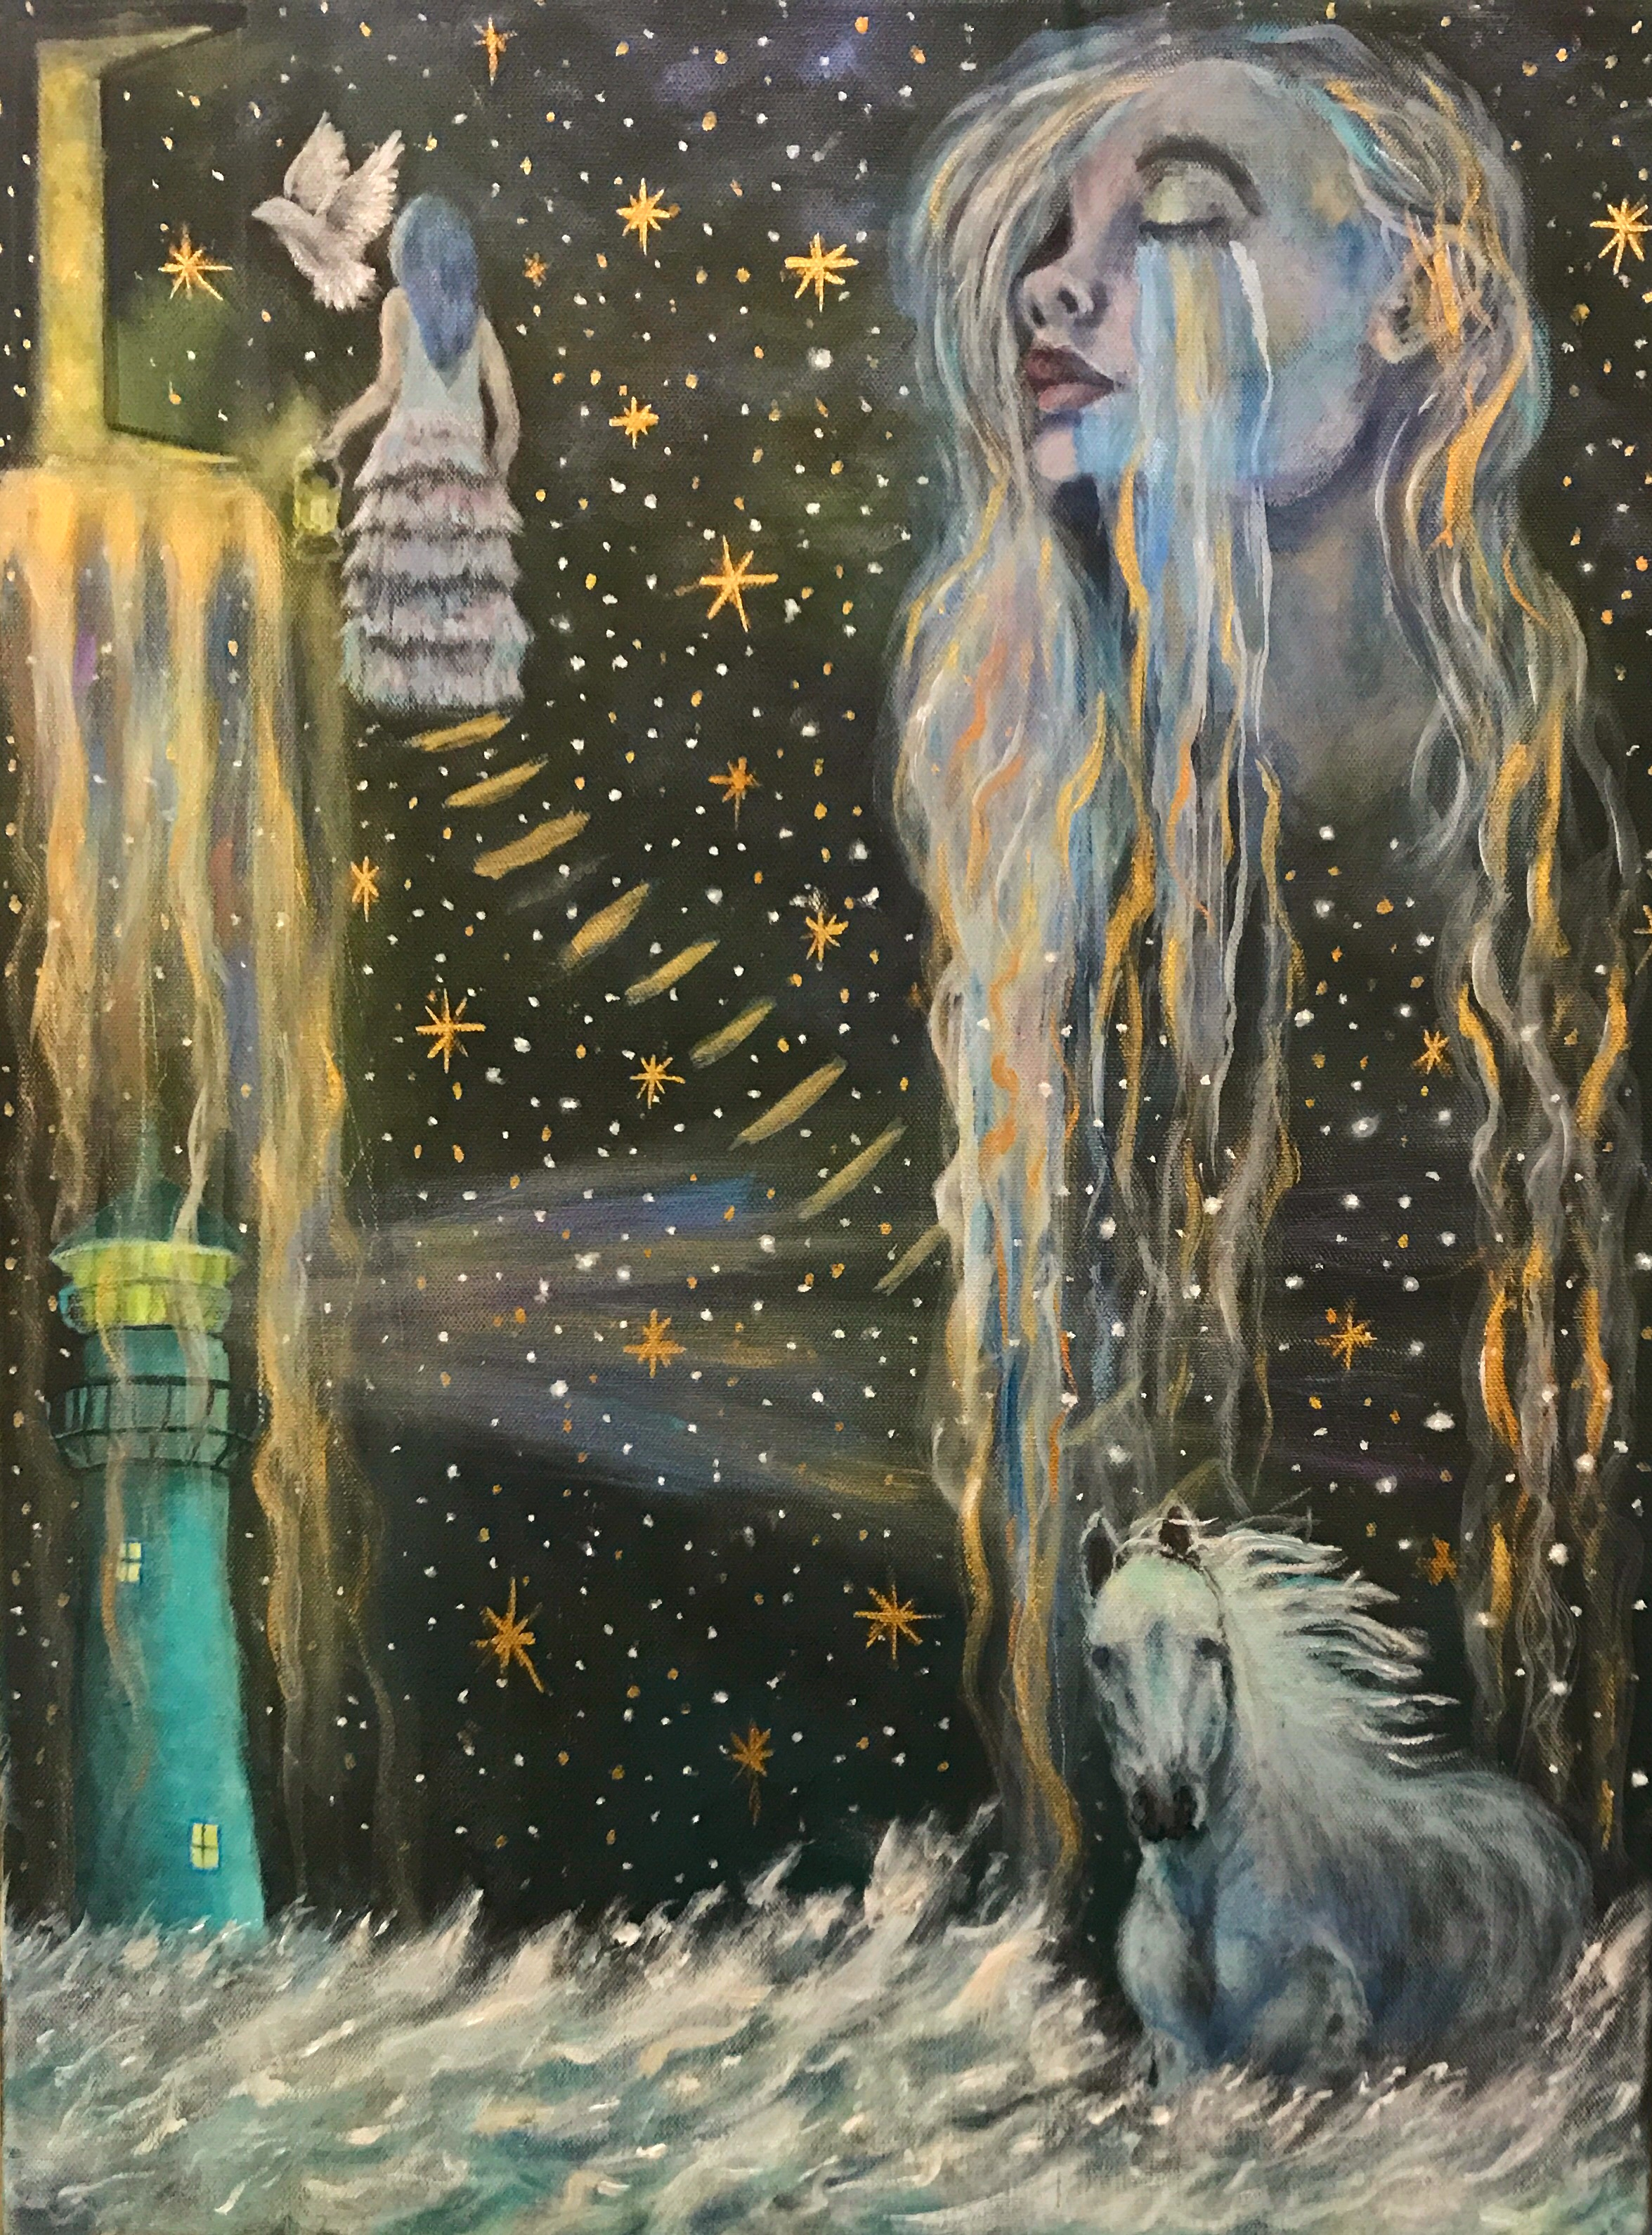 Gentle Loving Steps - Towards My Soul